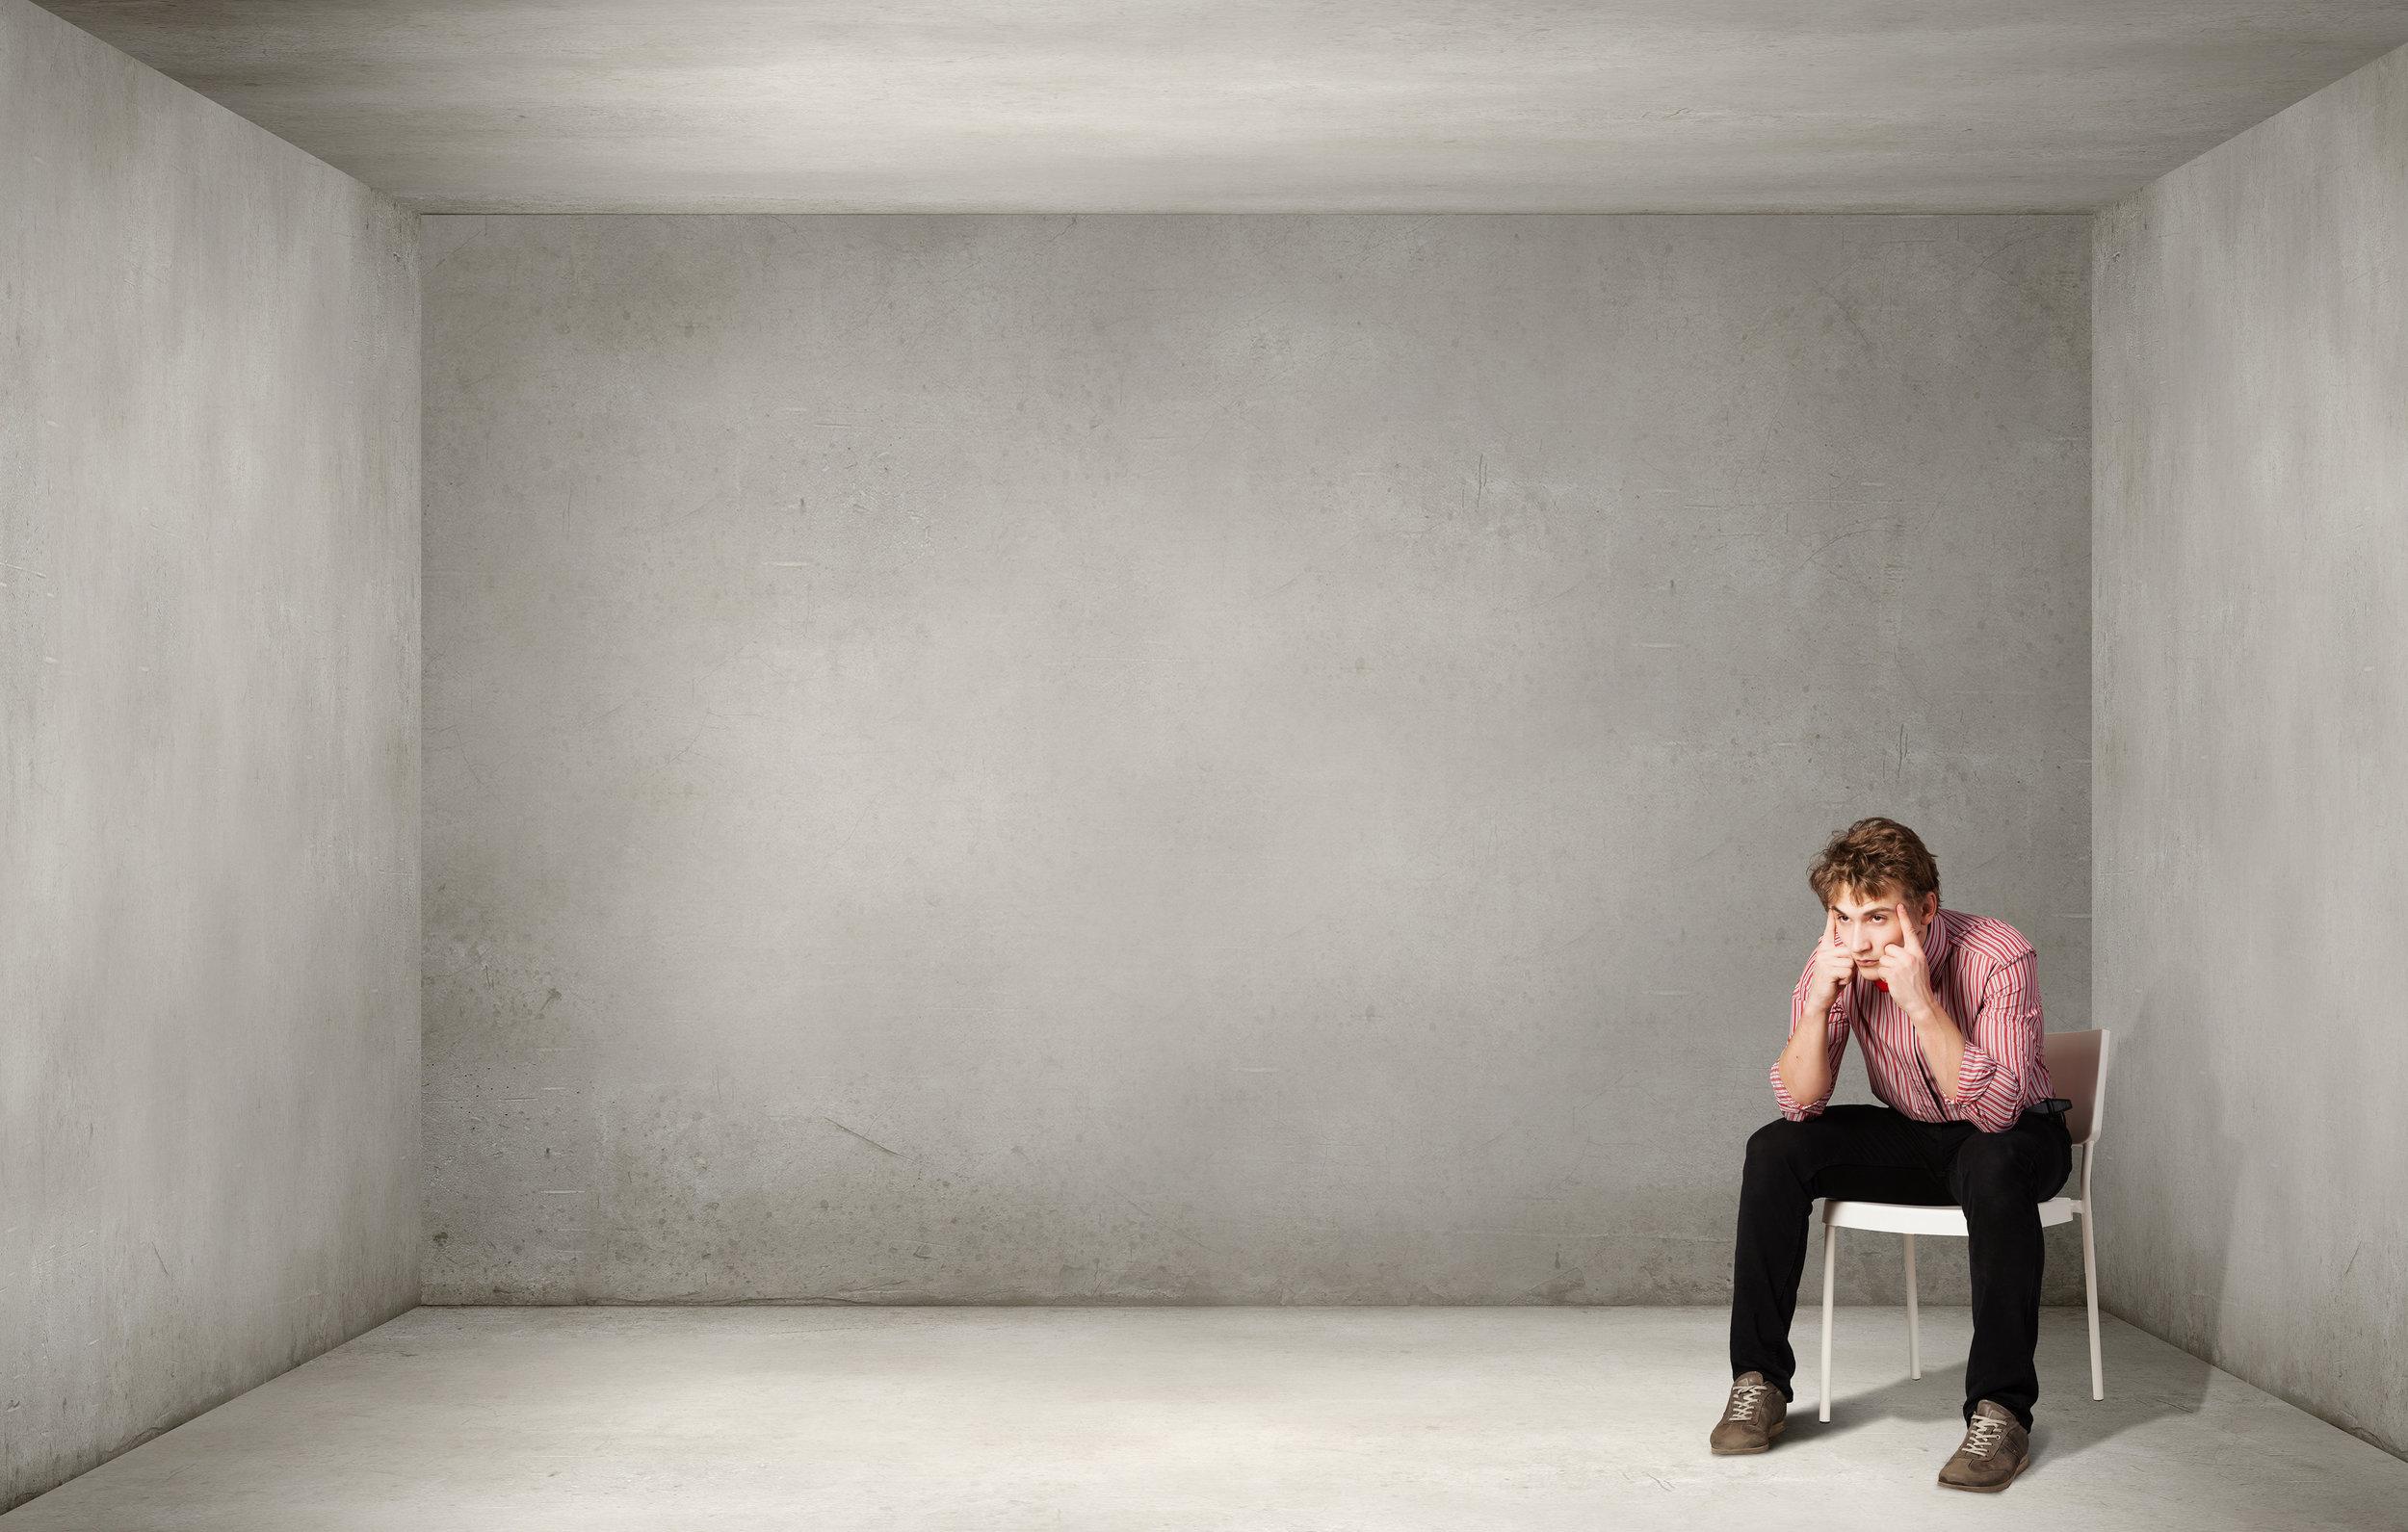 Depressed-man-sitting-on-a-cha-99057314.jpg